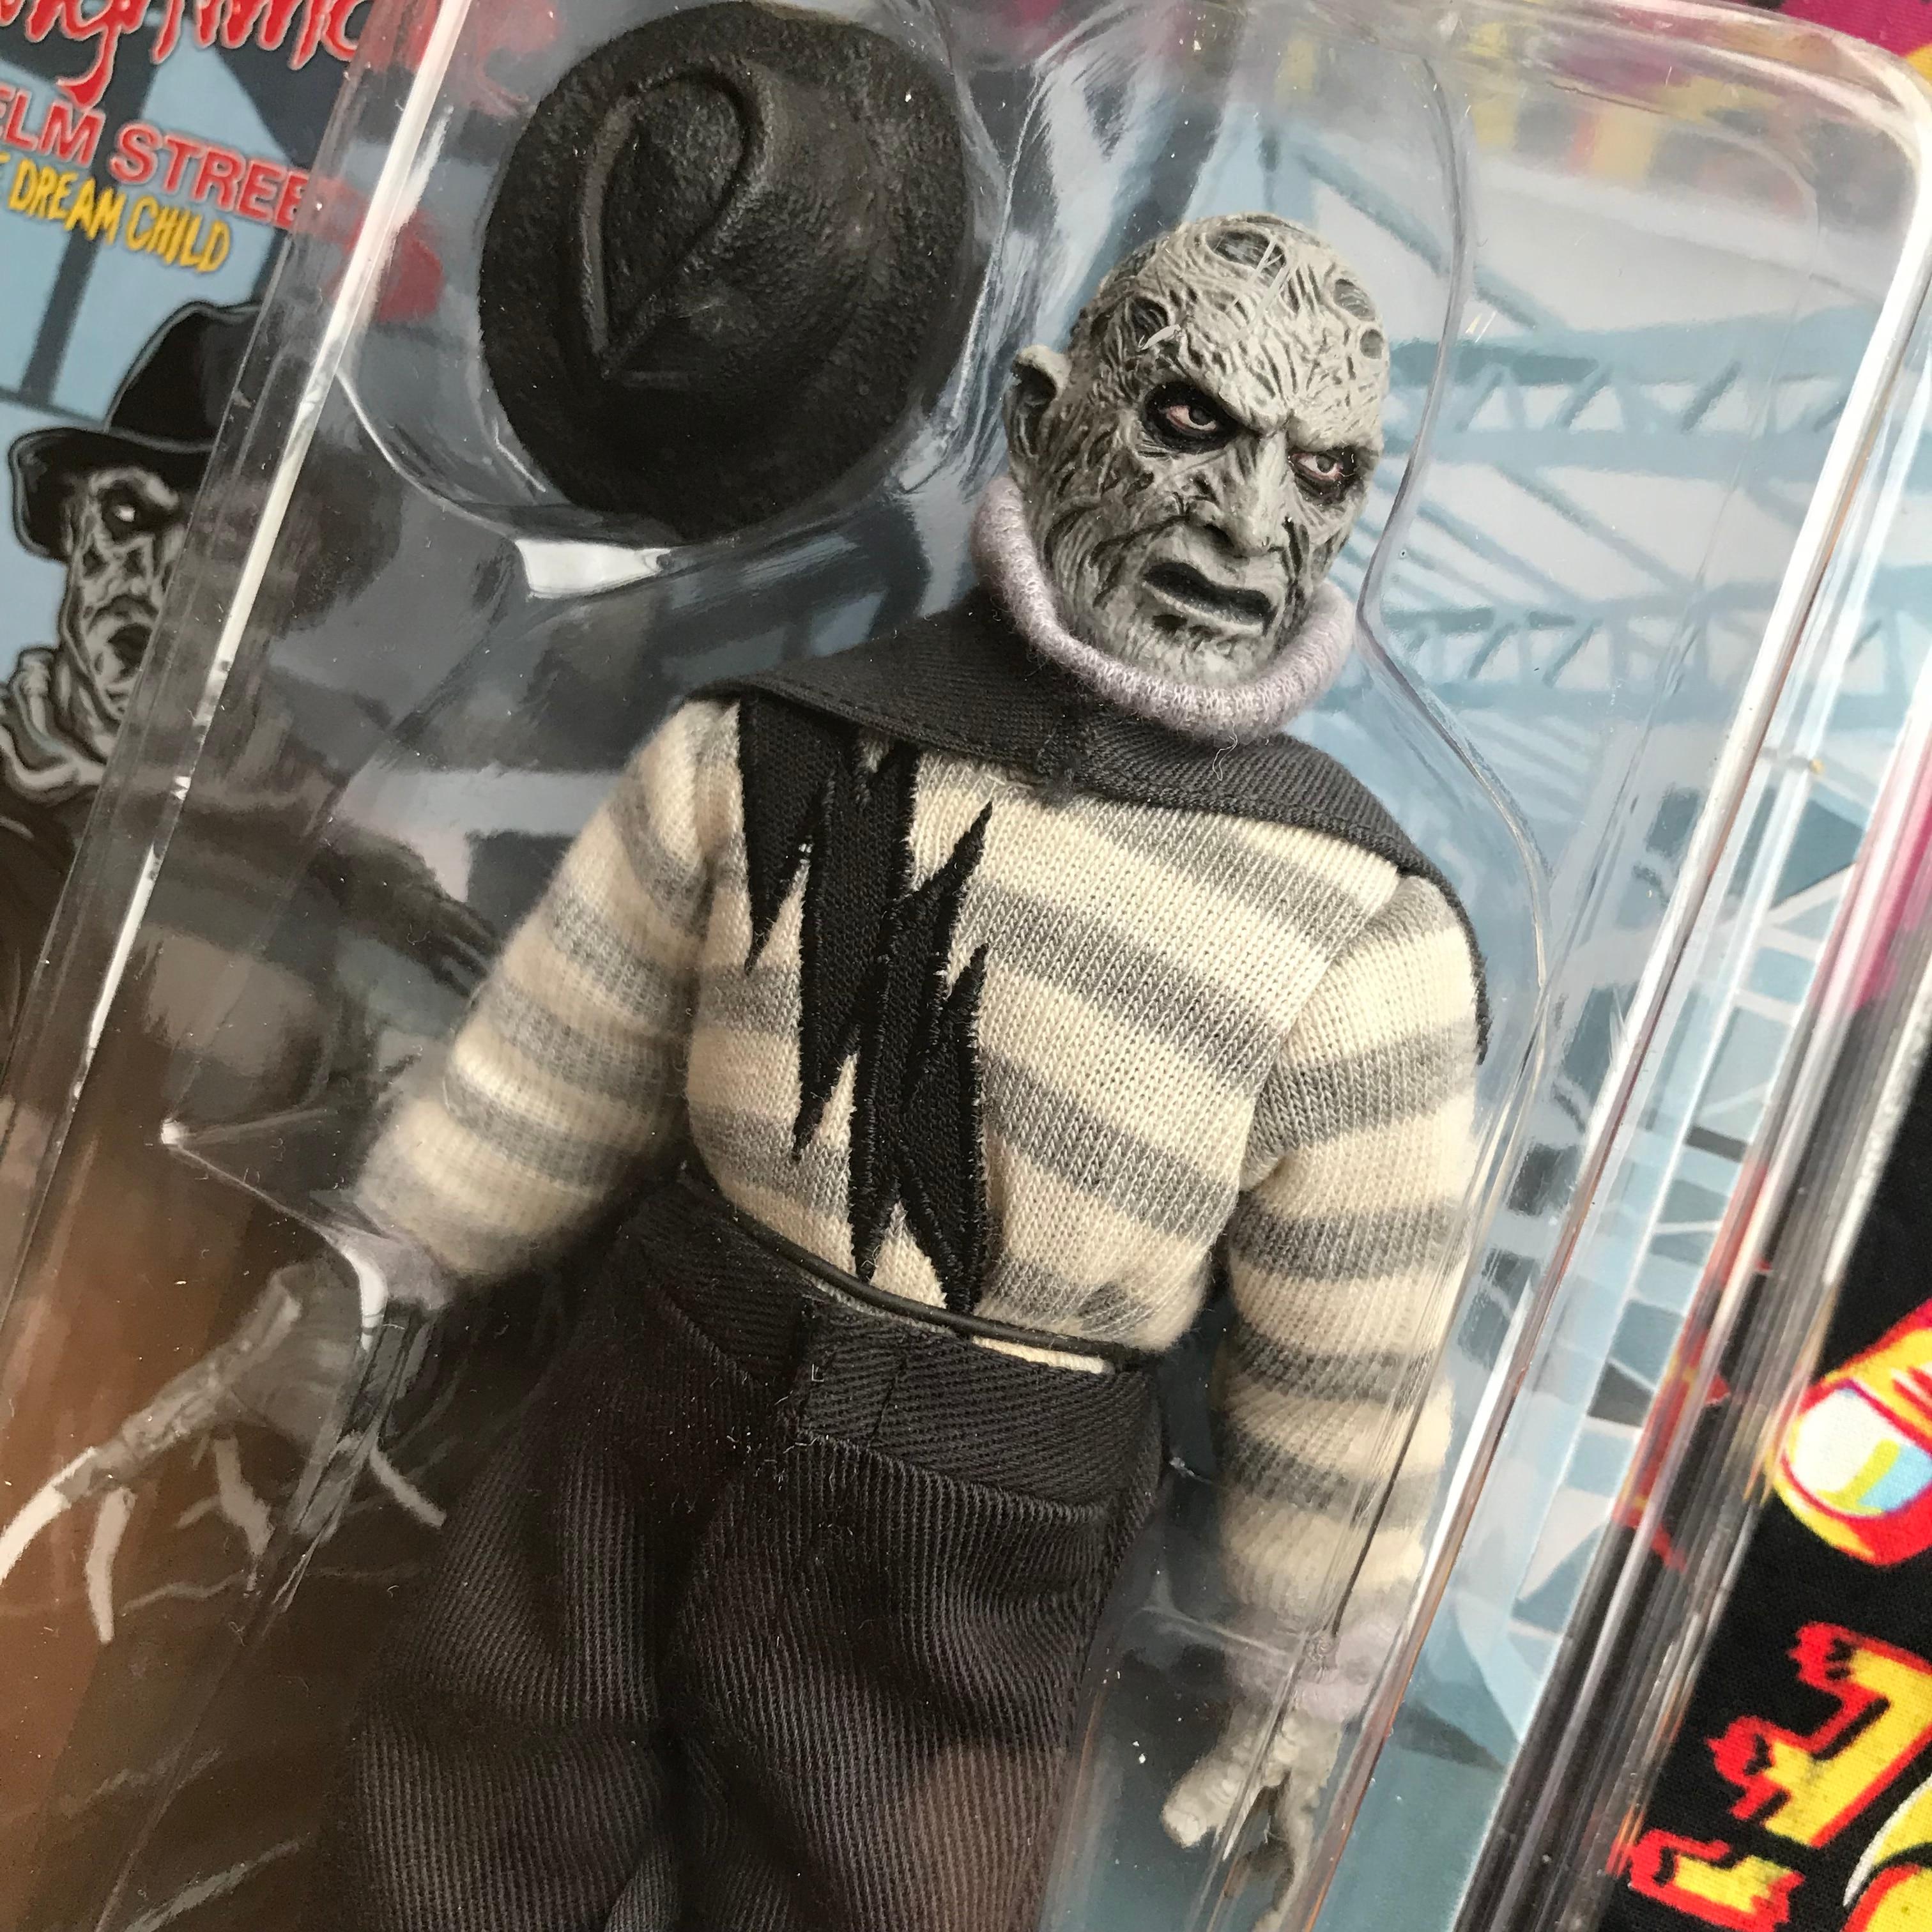 Original NECA Exclusive Old Goods Box Toy Horror: a